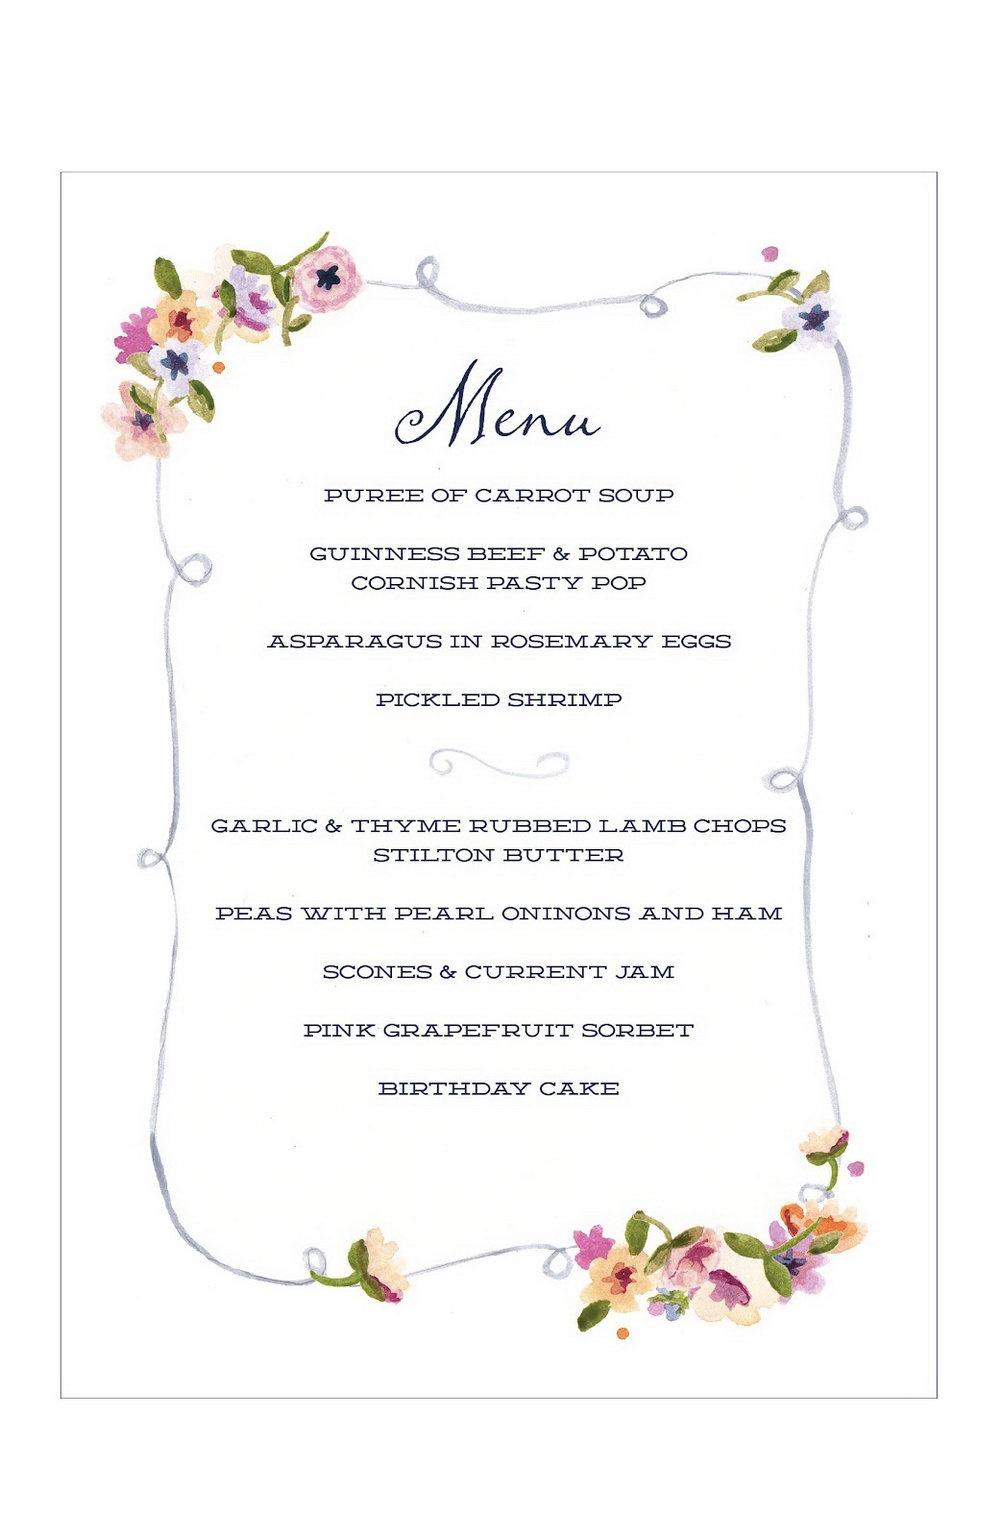 008 Template Ideas Dinner Party Menu Marvelous Templates Free Online - Free Printable Dinner Party Menu Template